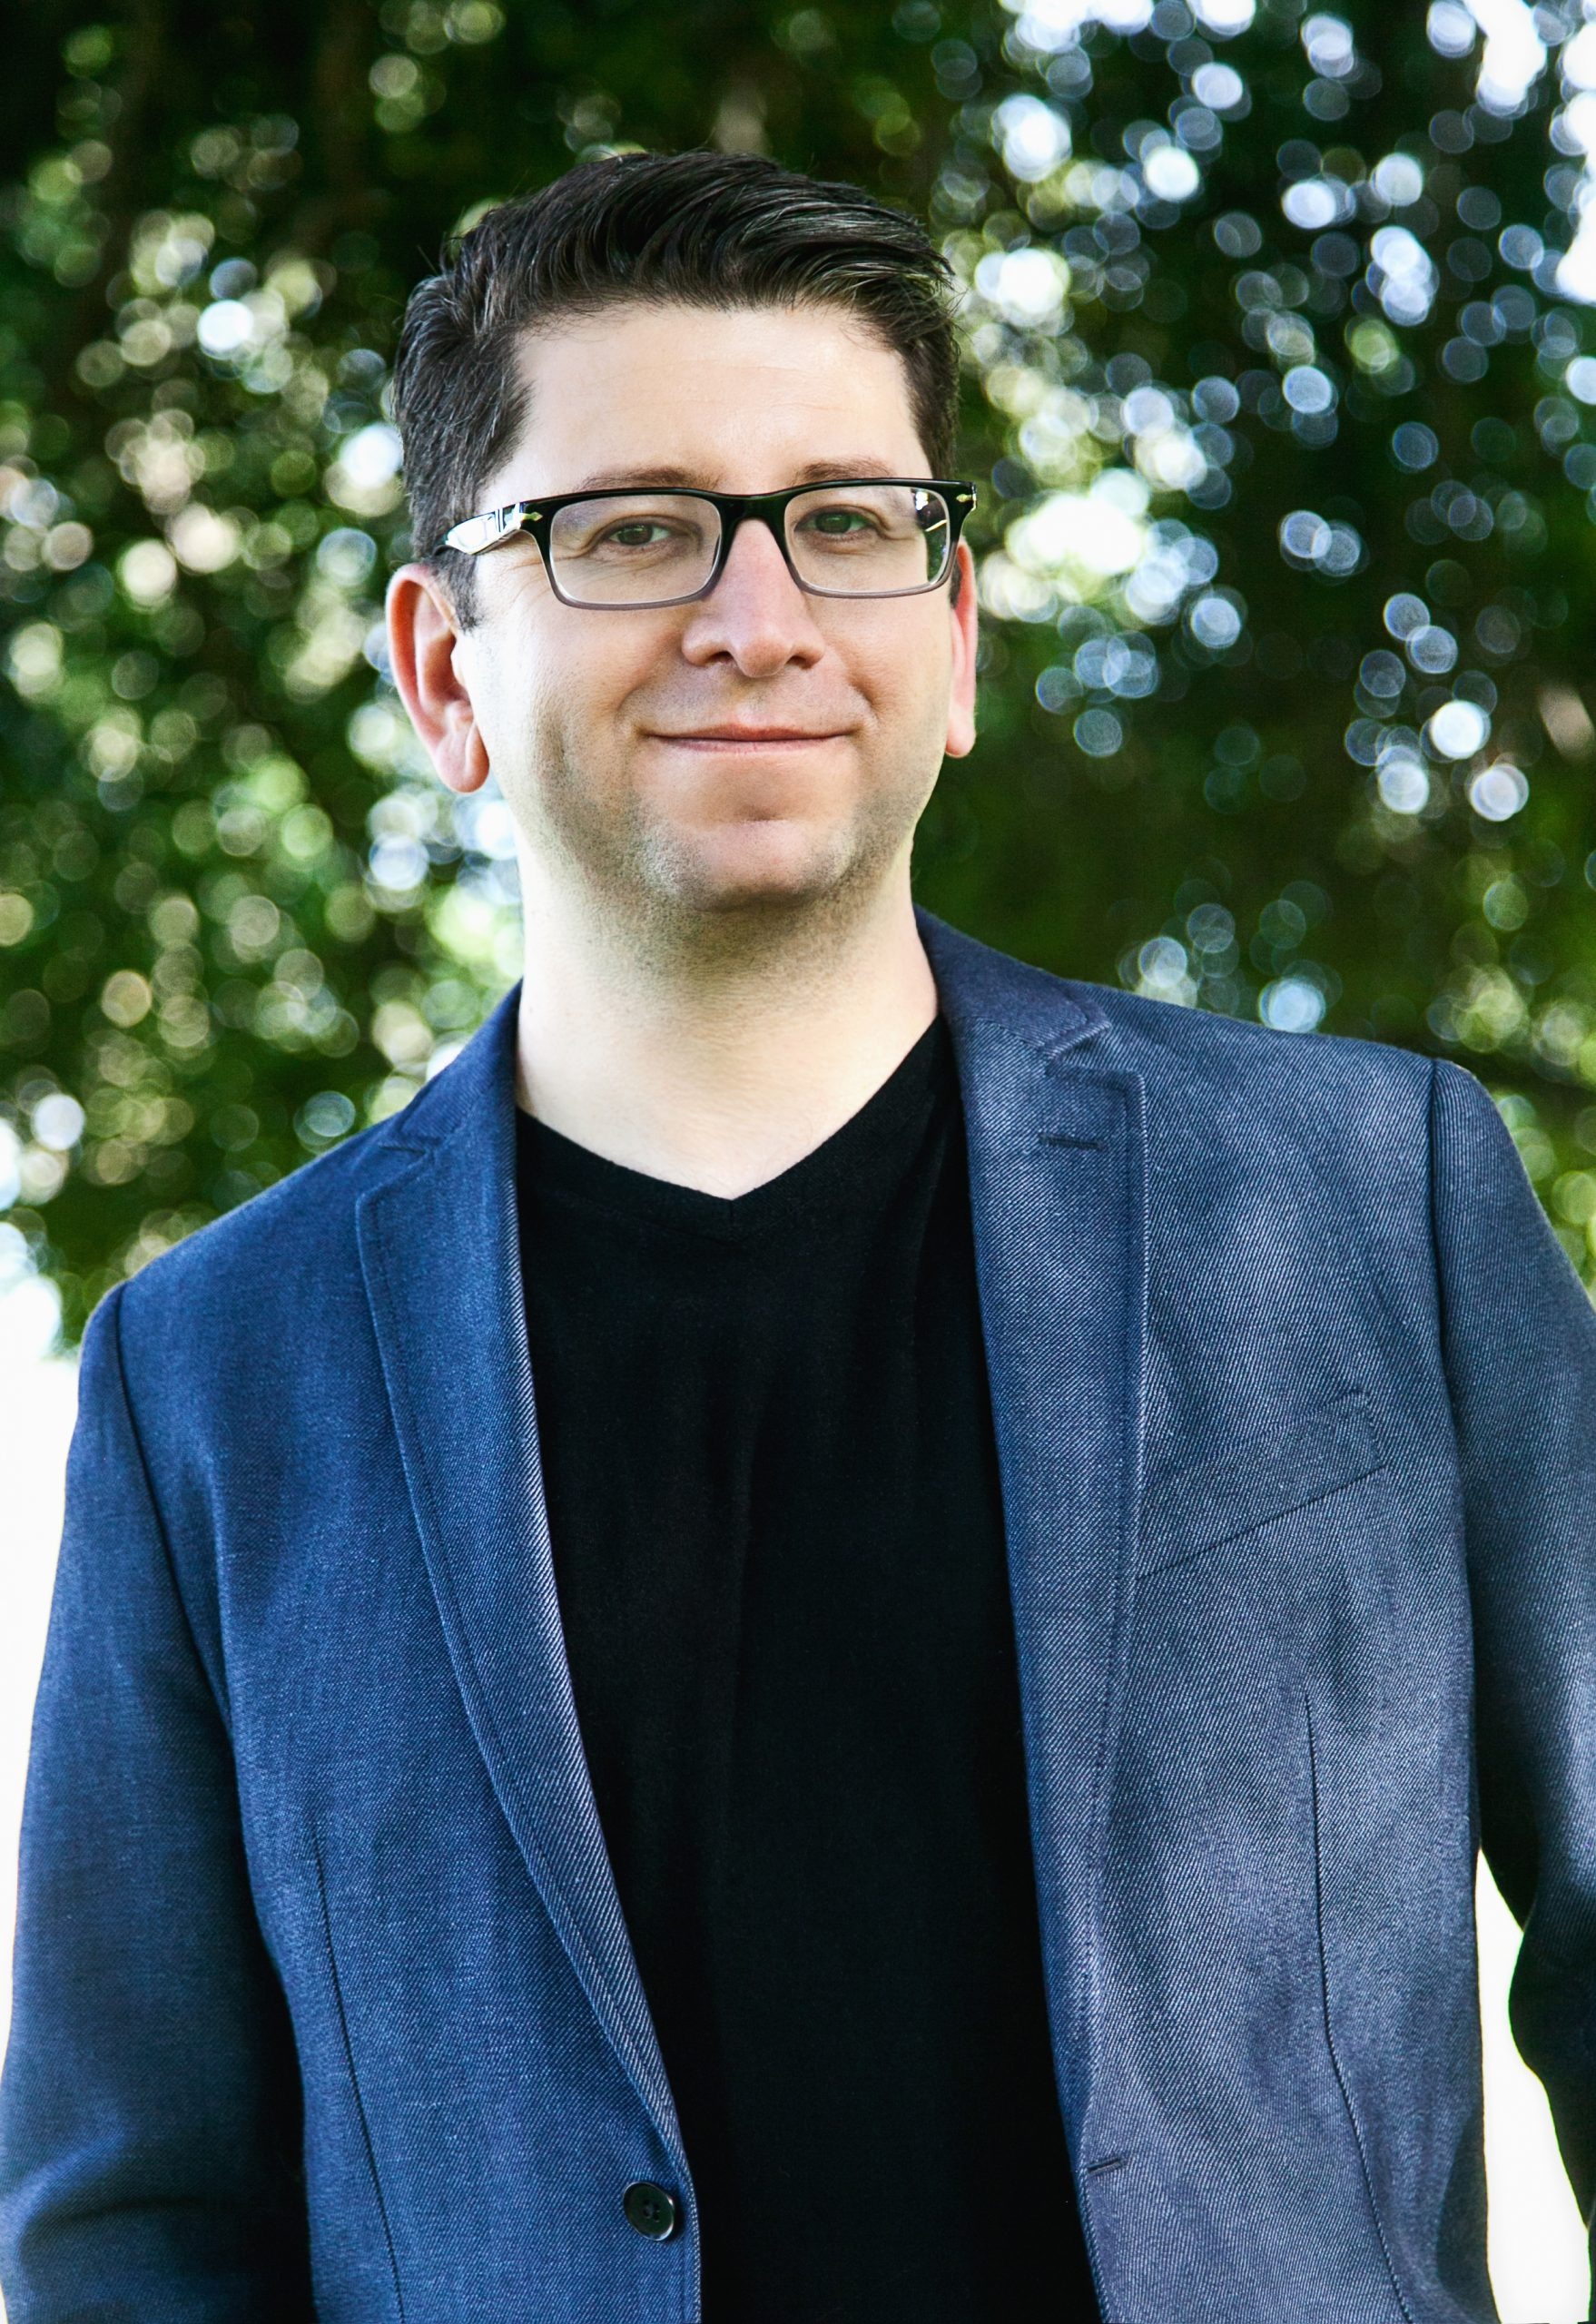 Zach Loeb - Corporate Wellness Company Leader